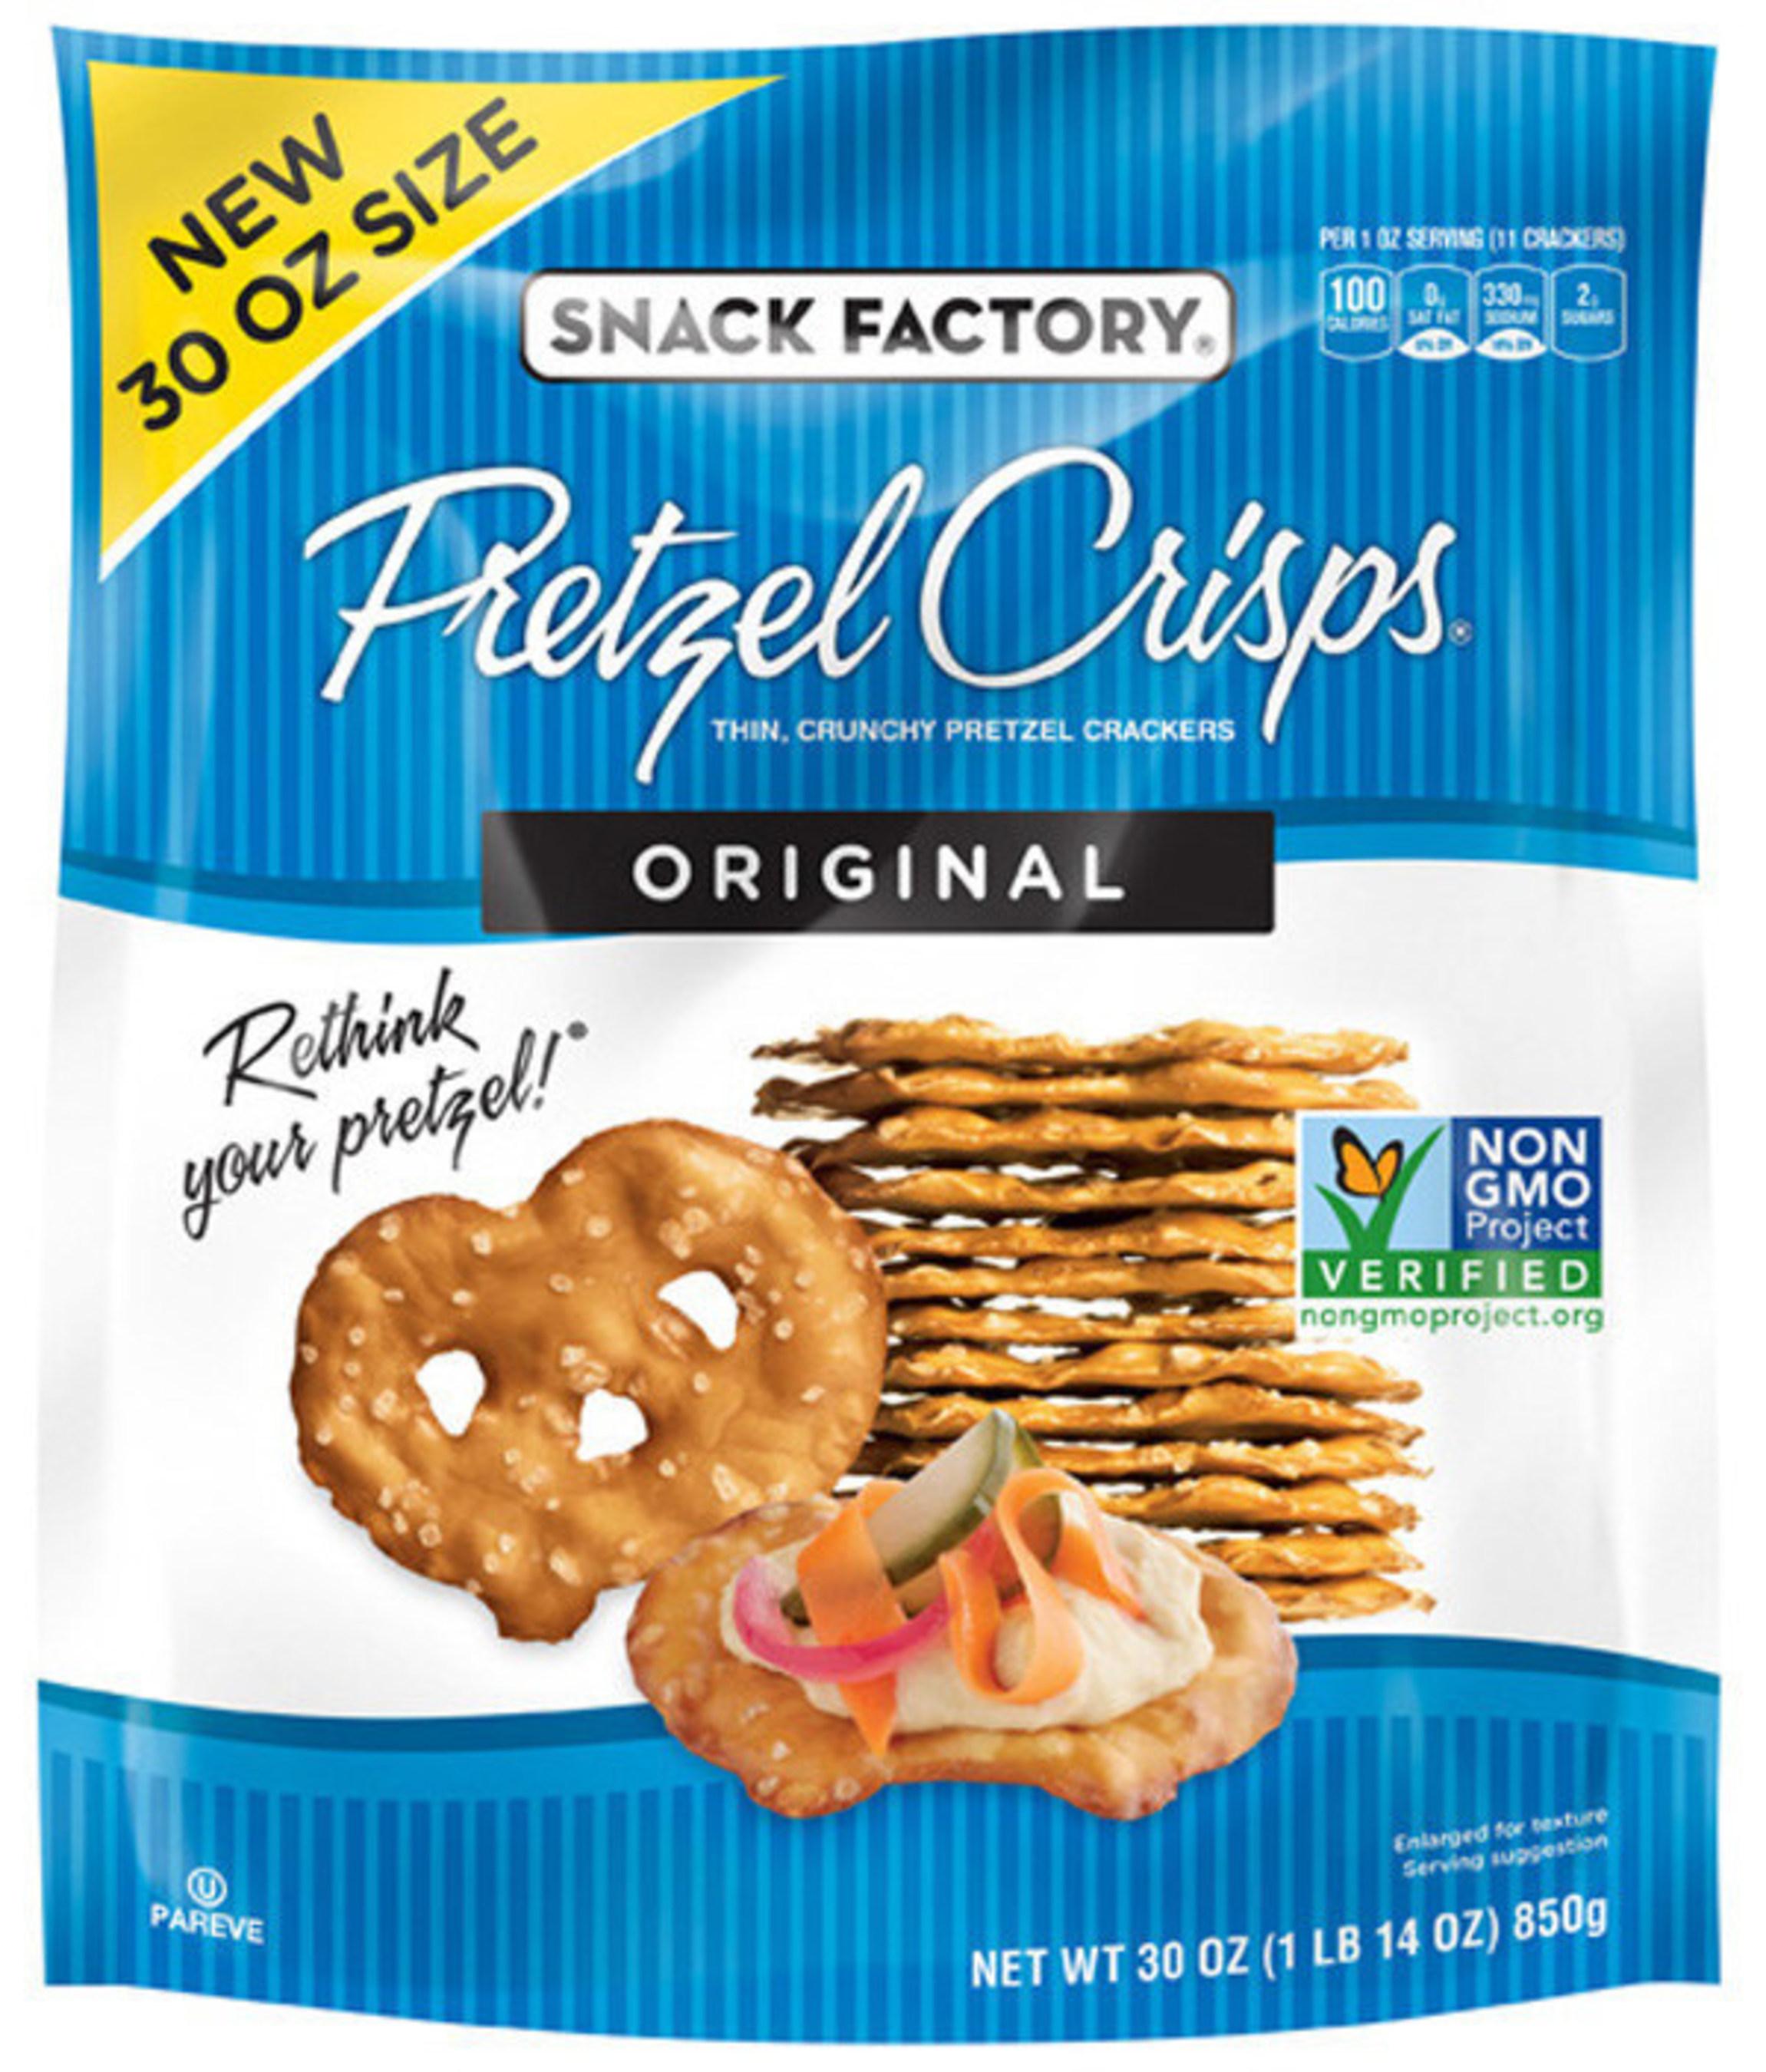 30 oz. Snack Factory(R) Original Pretzel Crisps(R)